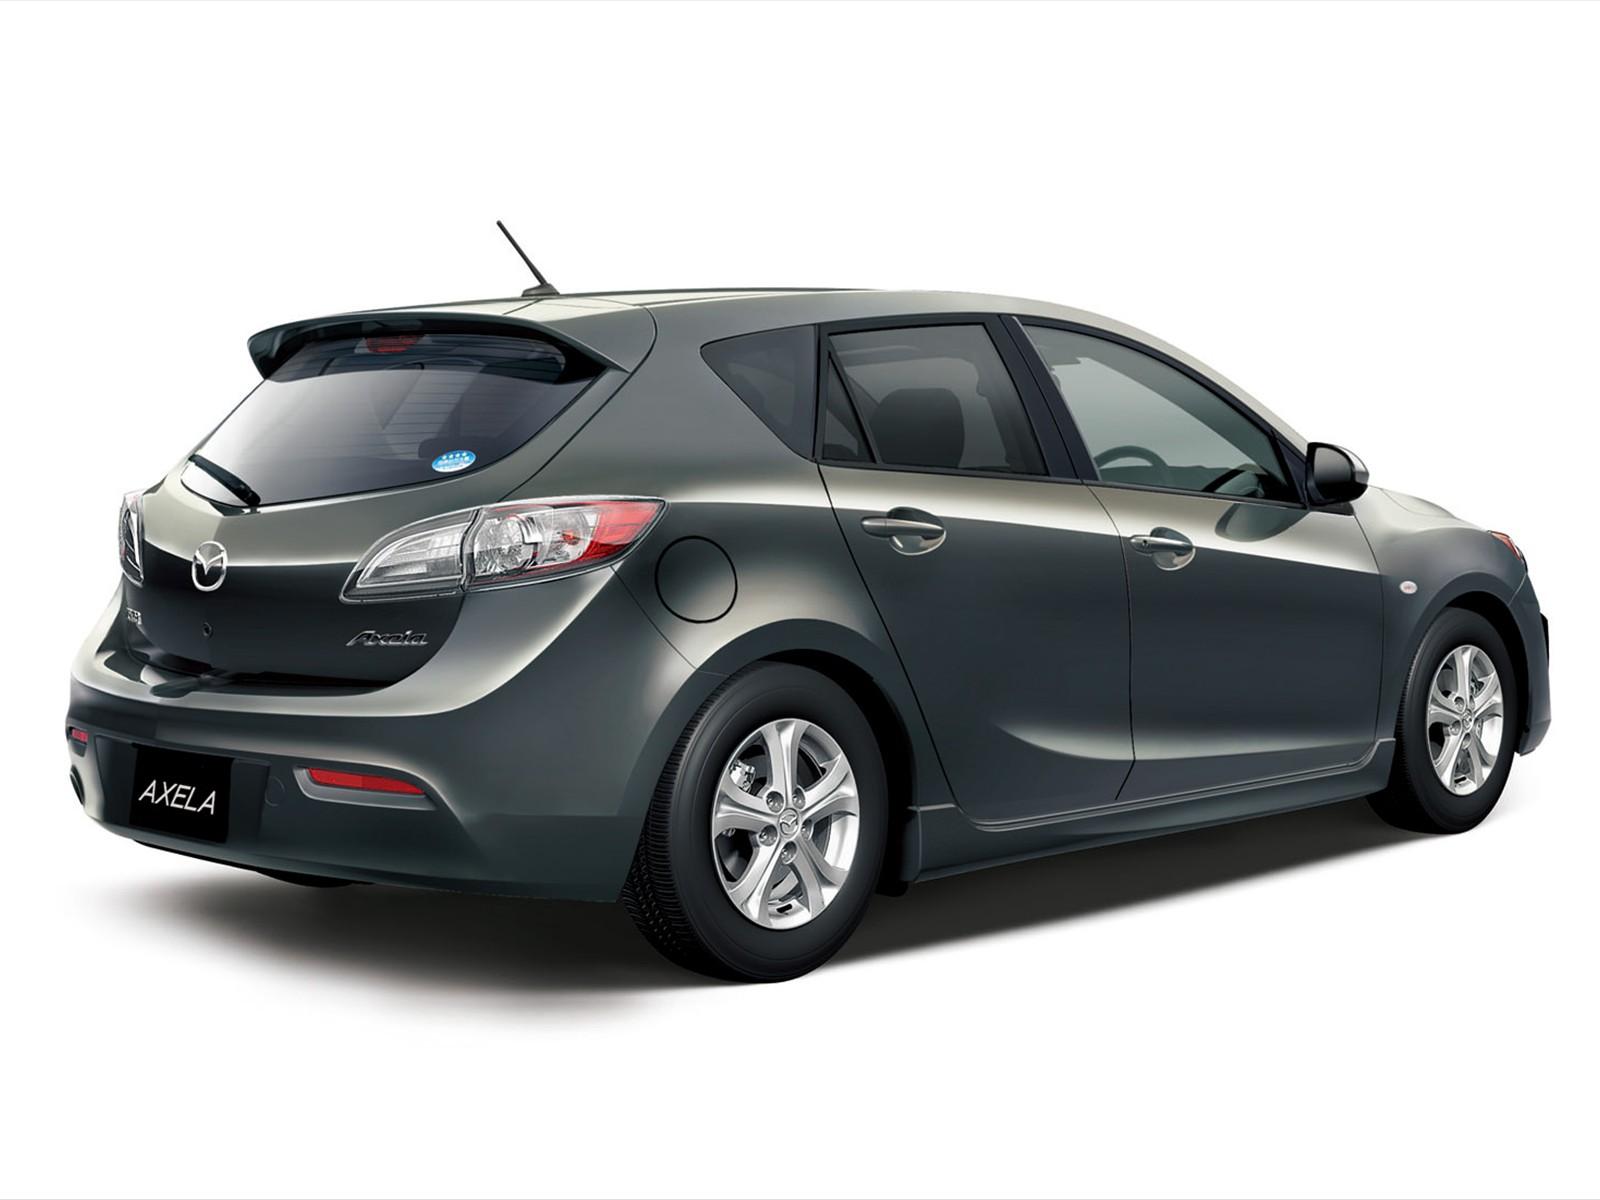 Car Pictures: Mazda Axela Sport 1.5 S Style